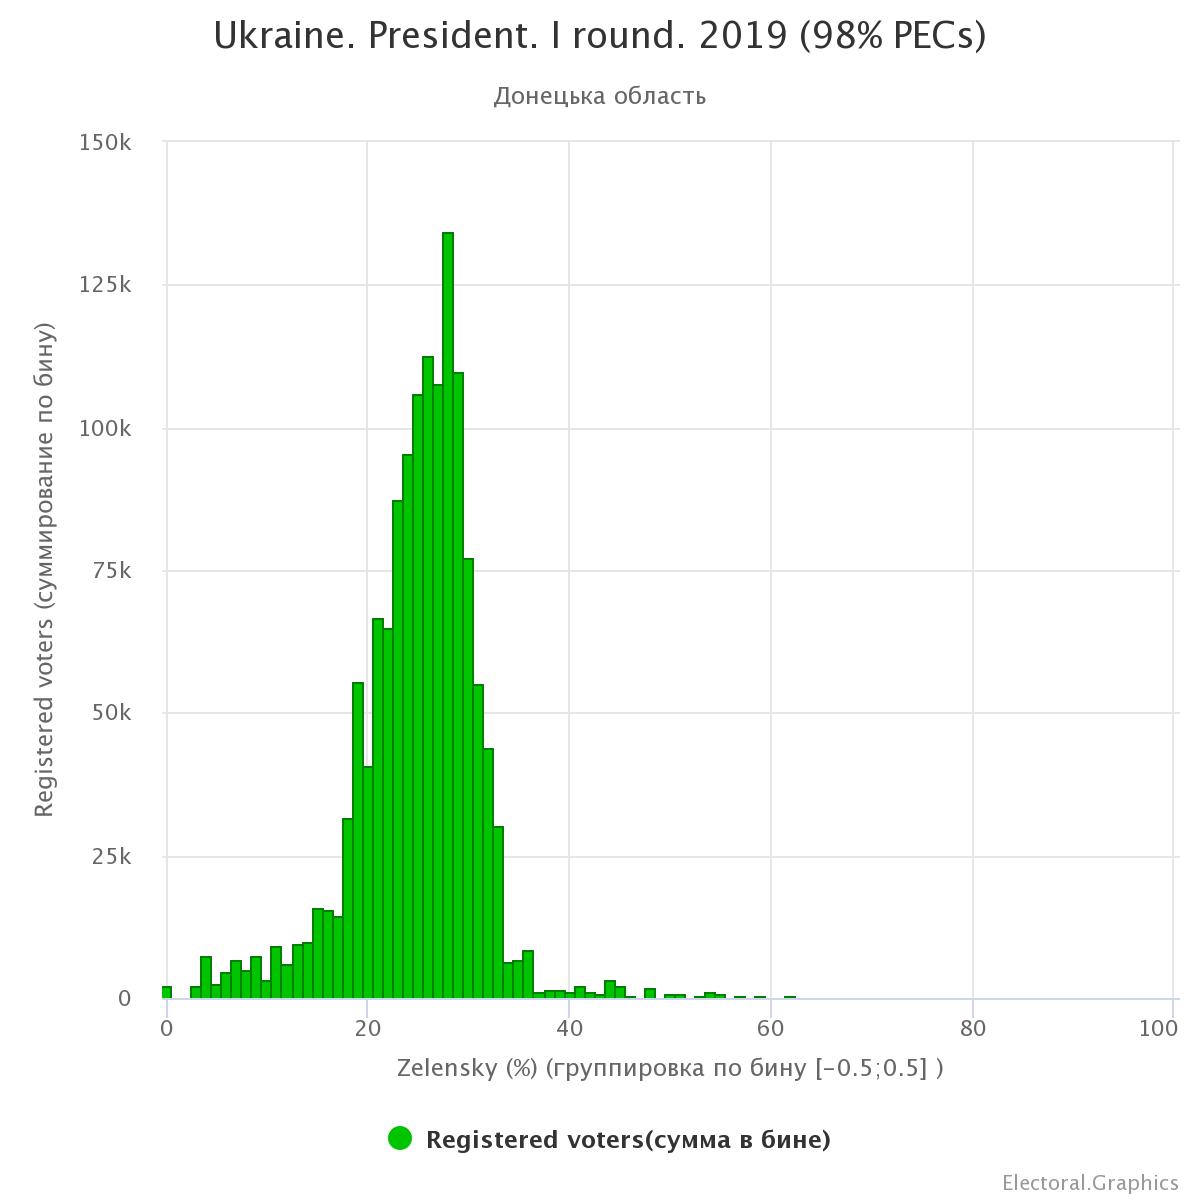 ukraine-president-i-roun (30).png